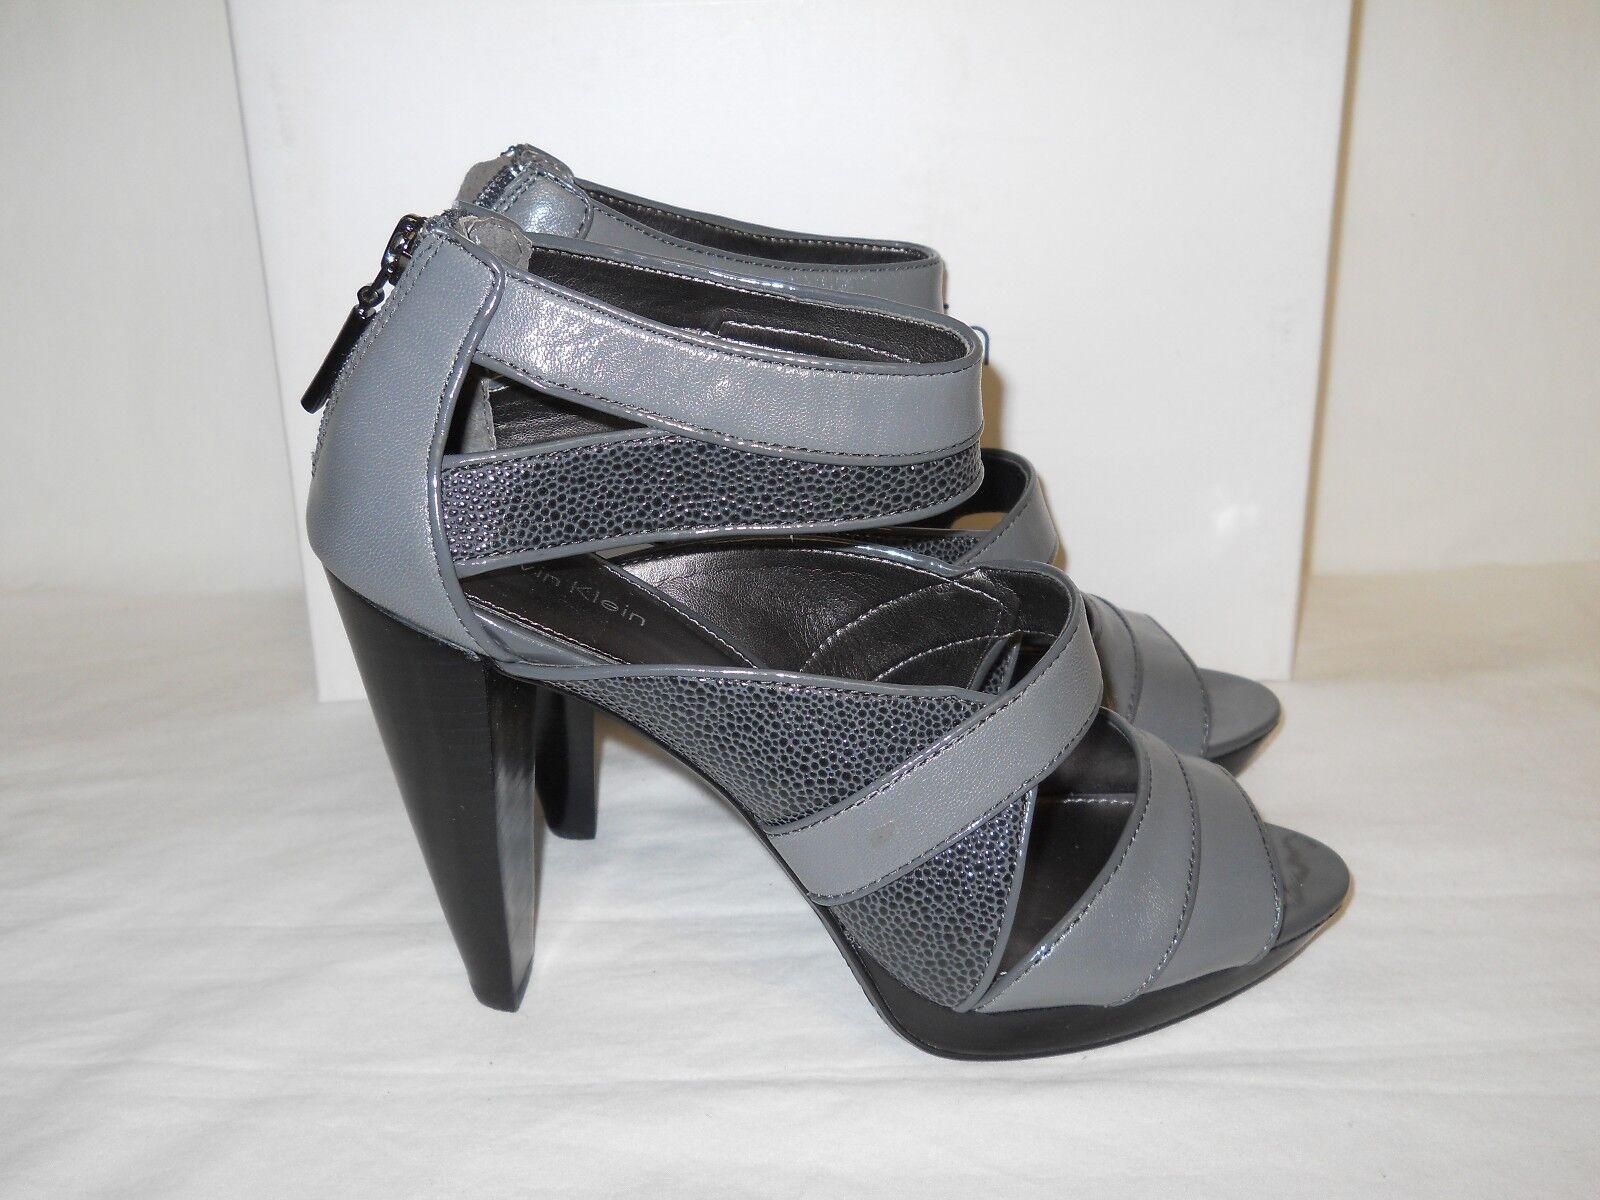 Calvin Klein NEU Damenschuhe Deliah Graphite Cavier Print Heel Sandales 7.5 M Schuhes